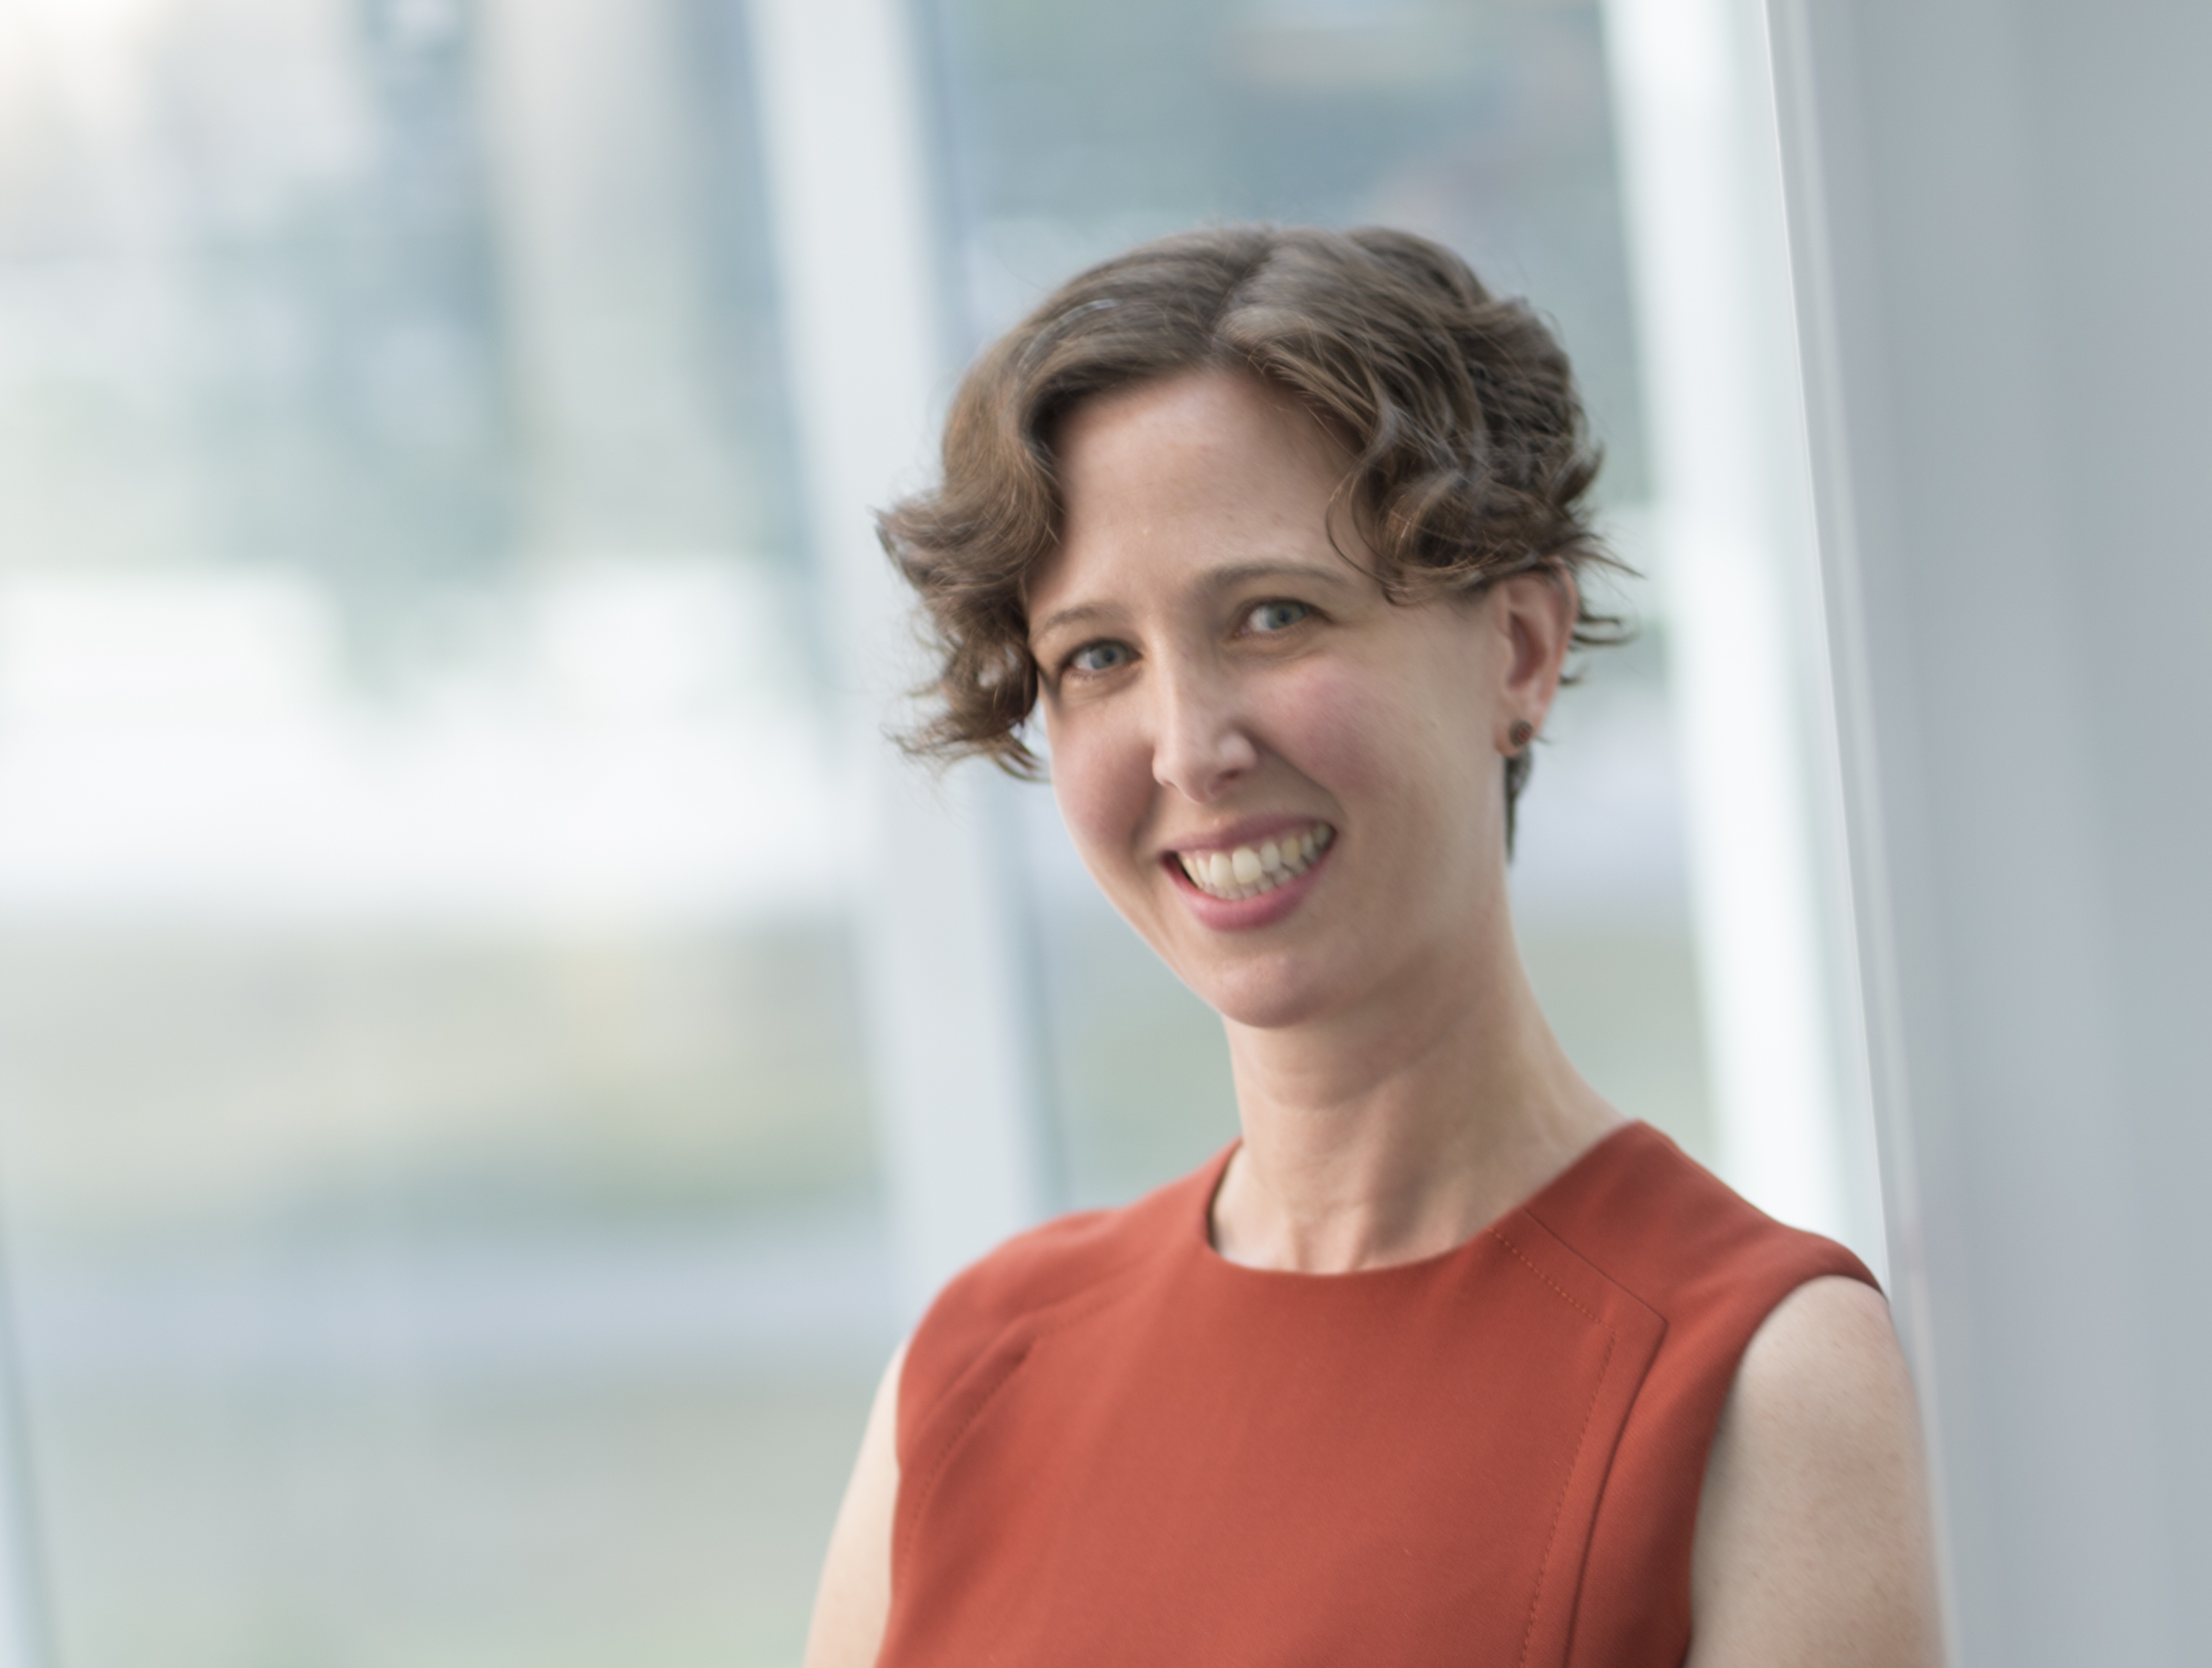 Alexis Abramson, Maltz Professor of Energy Innovation, Case Western Reserve University